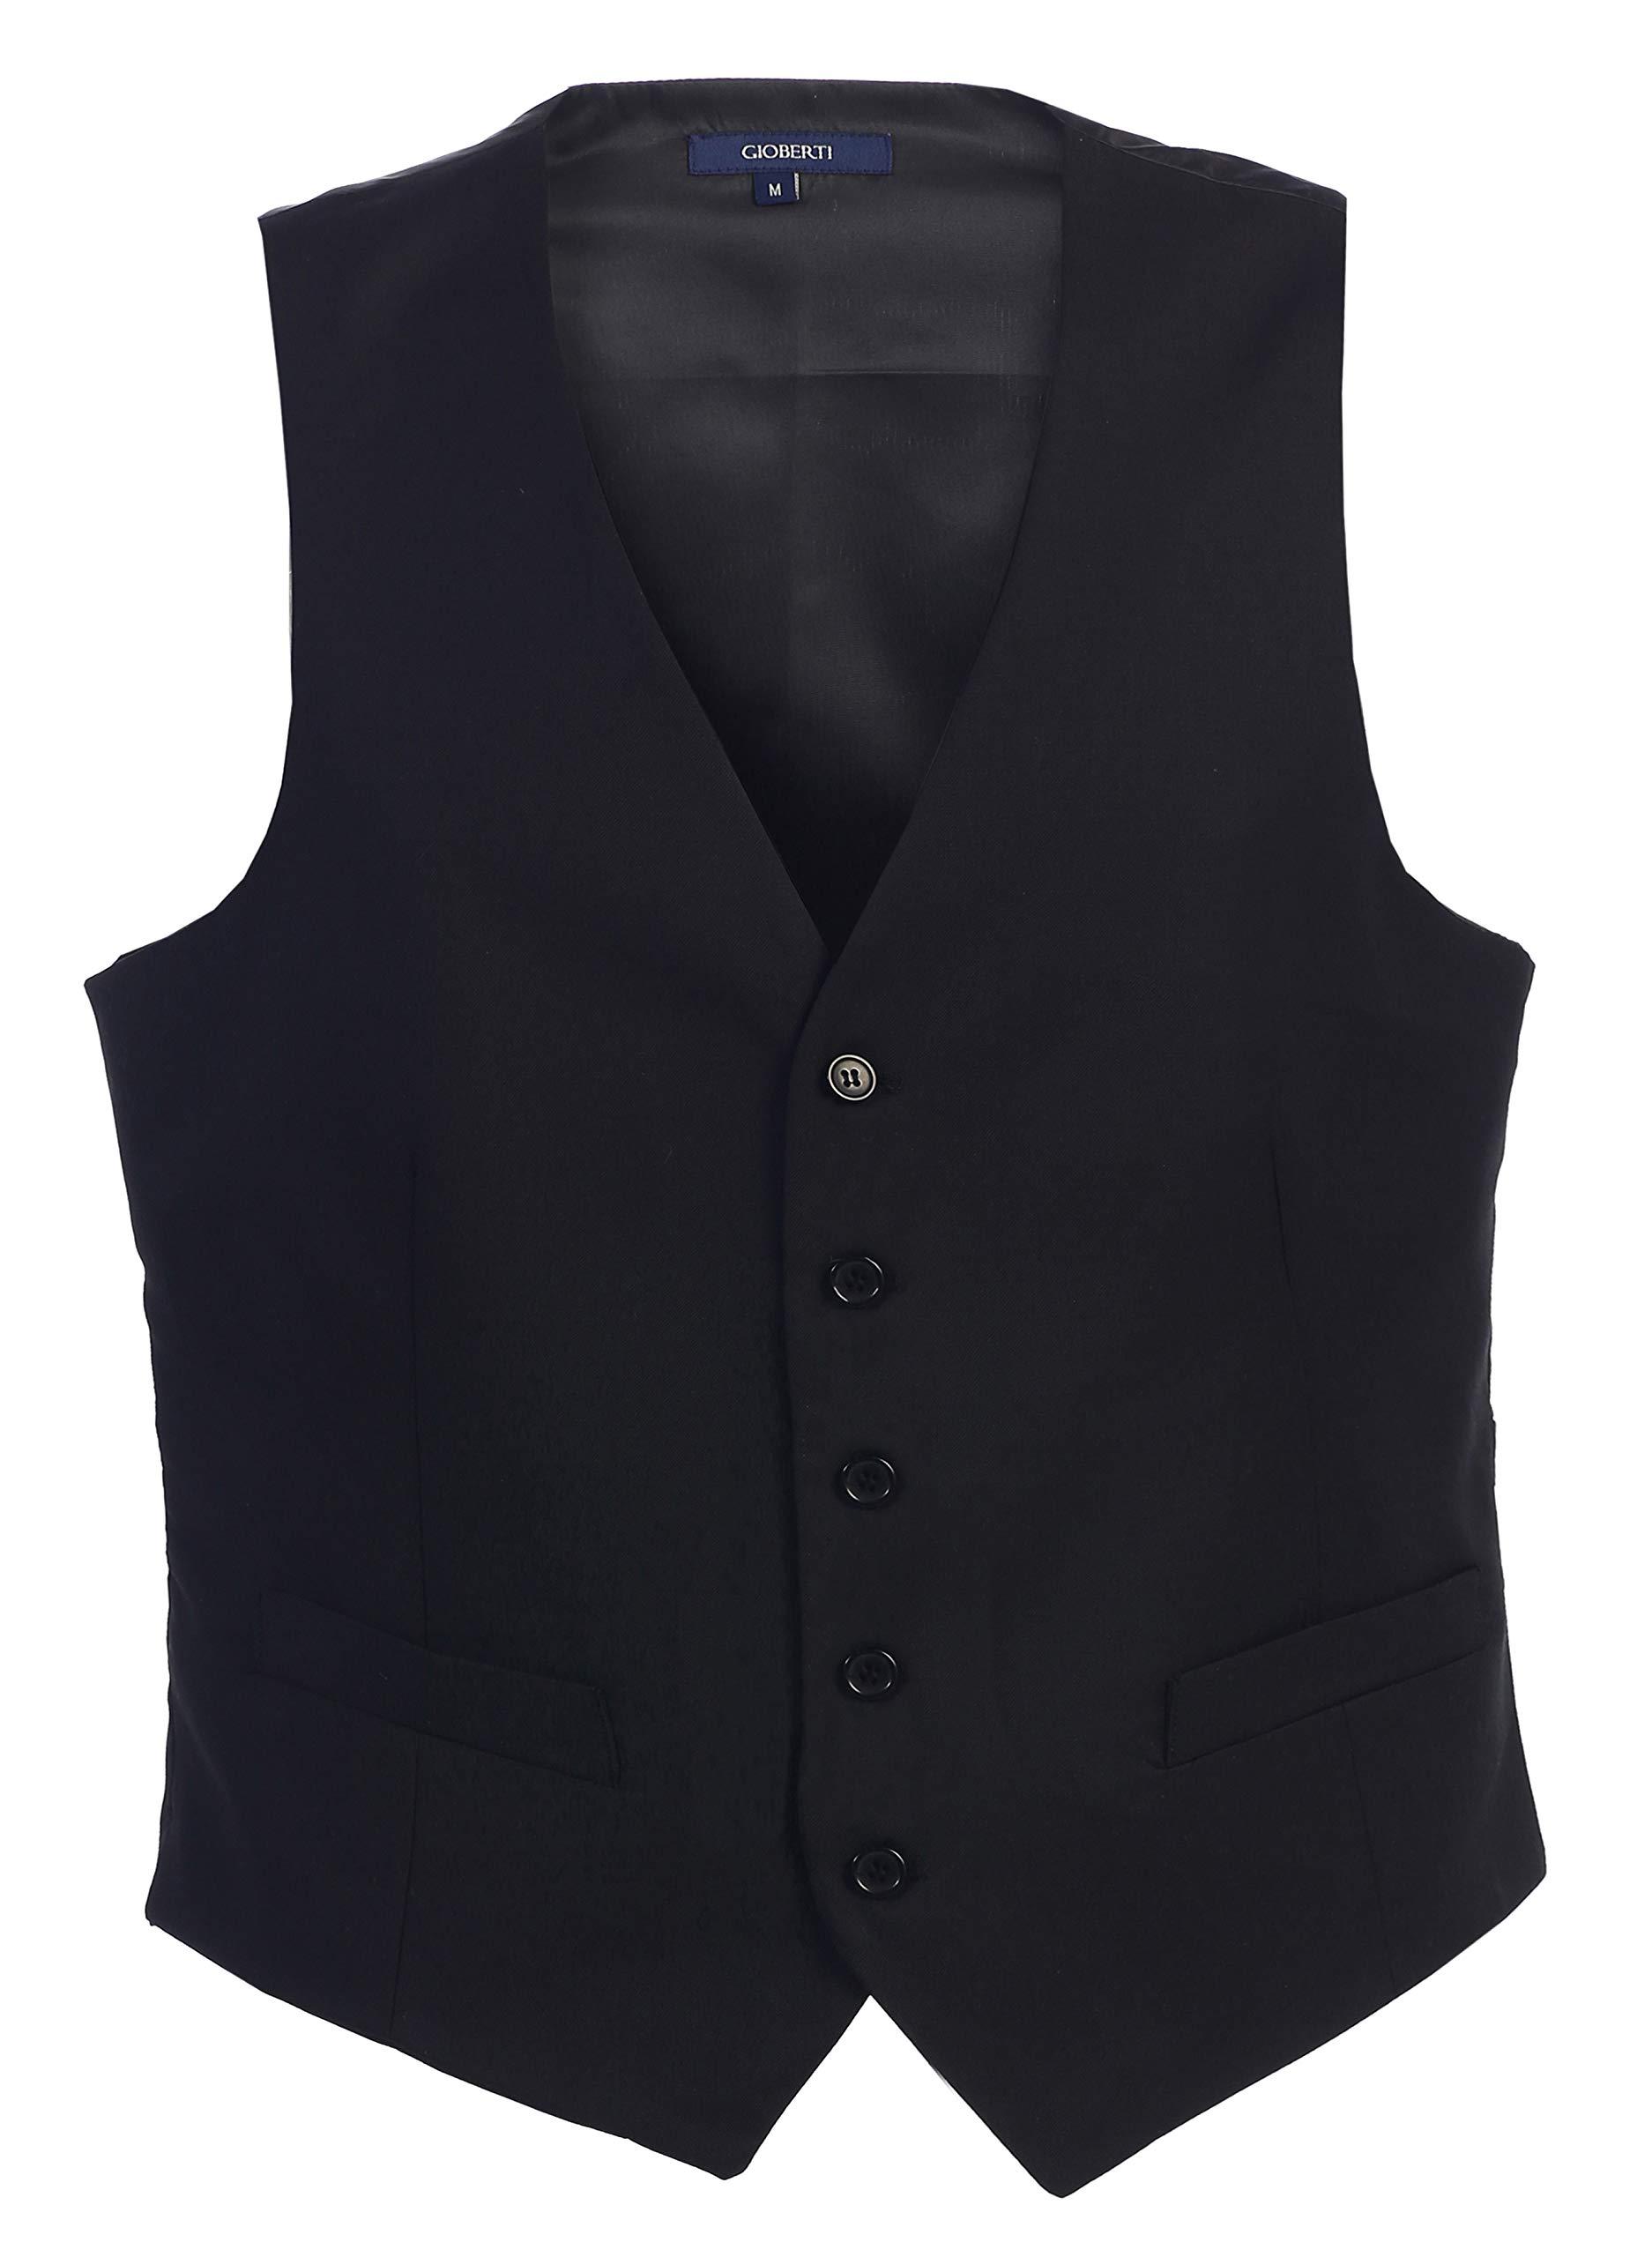 Gioberti Mens 5 Button Formal Suit Vest, Black, Large by Gioberti